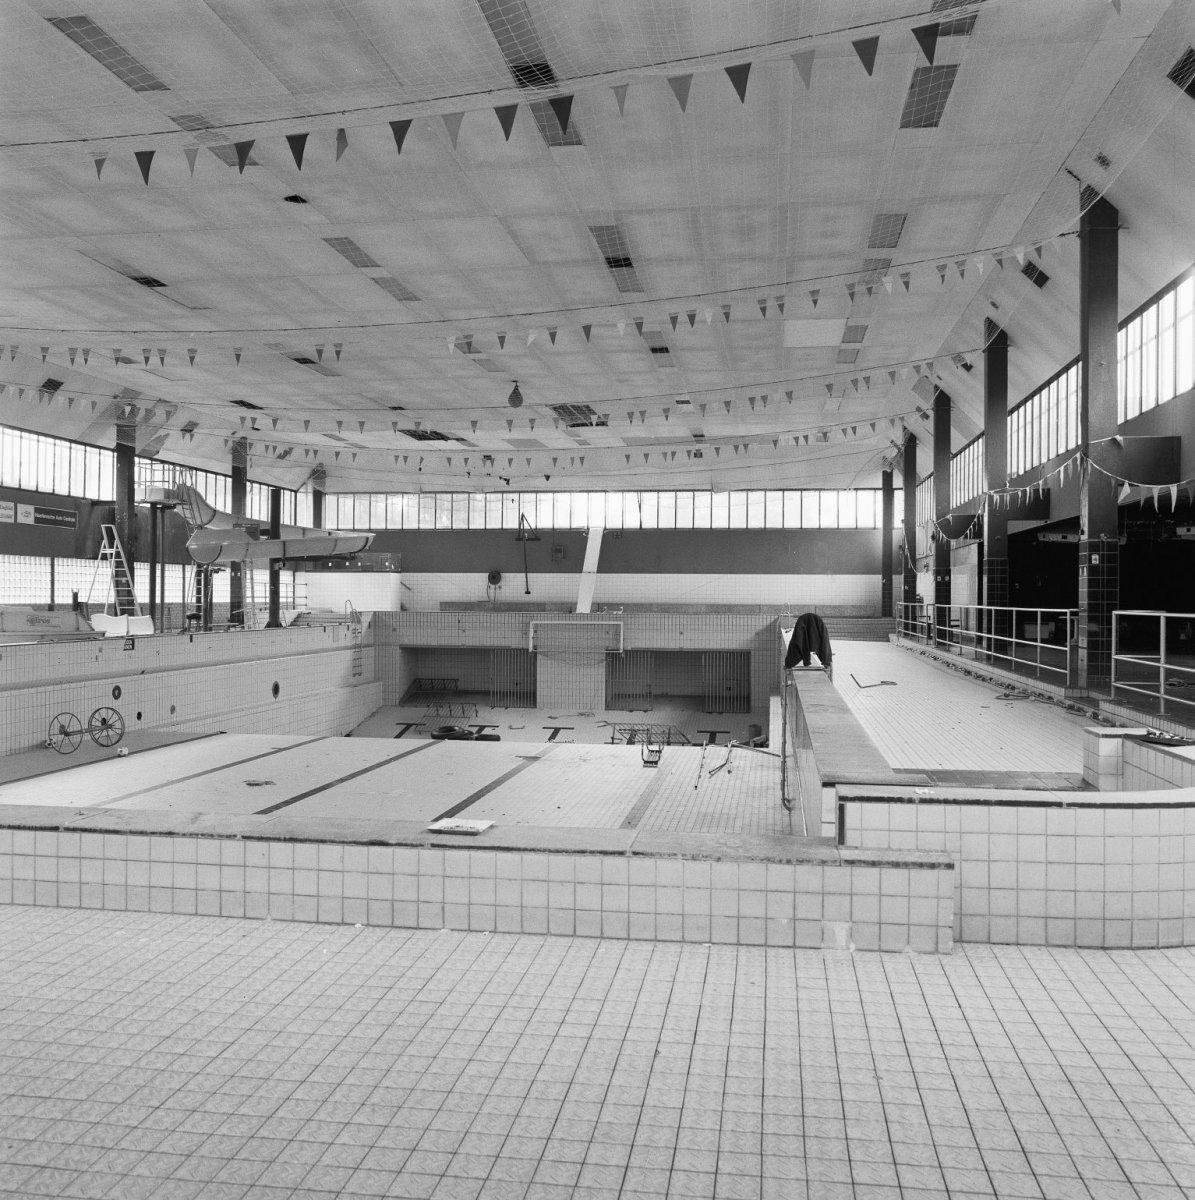 file interieur overzicht zwembad haarlem 20279637